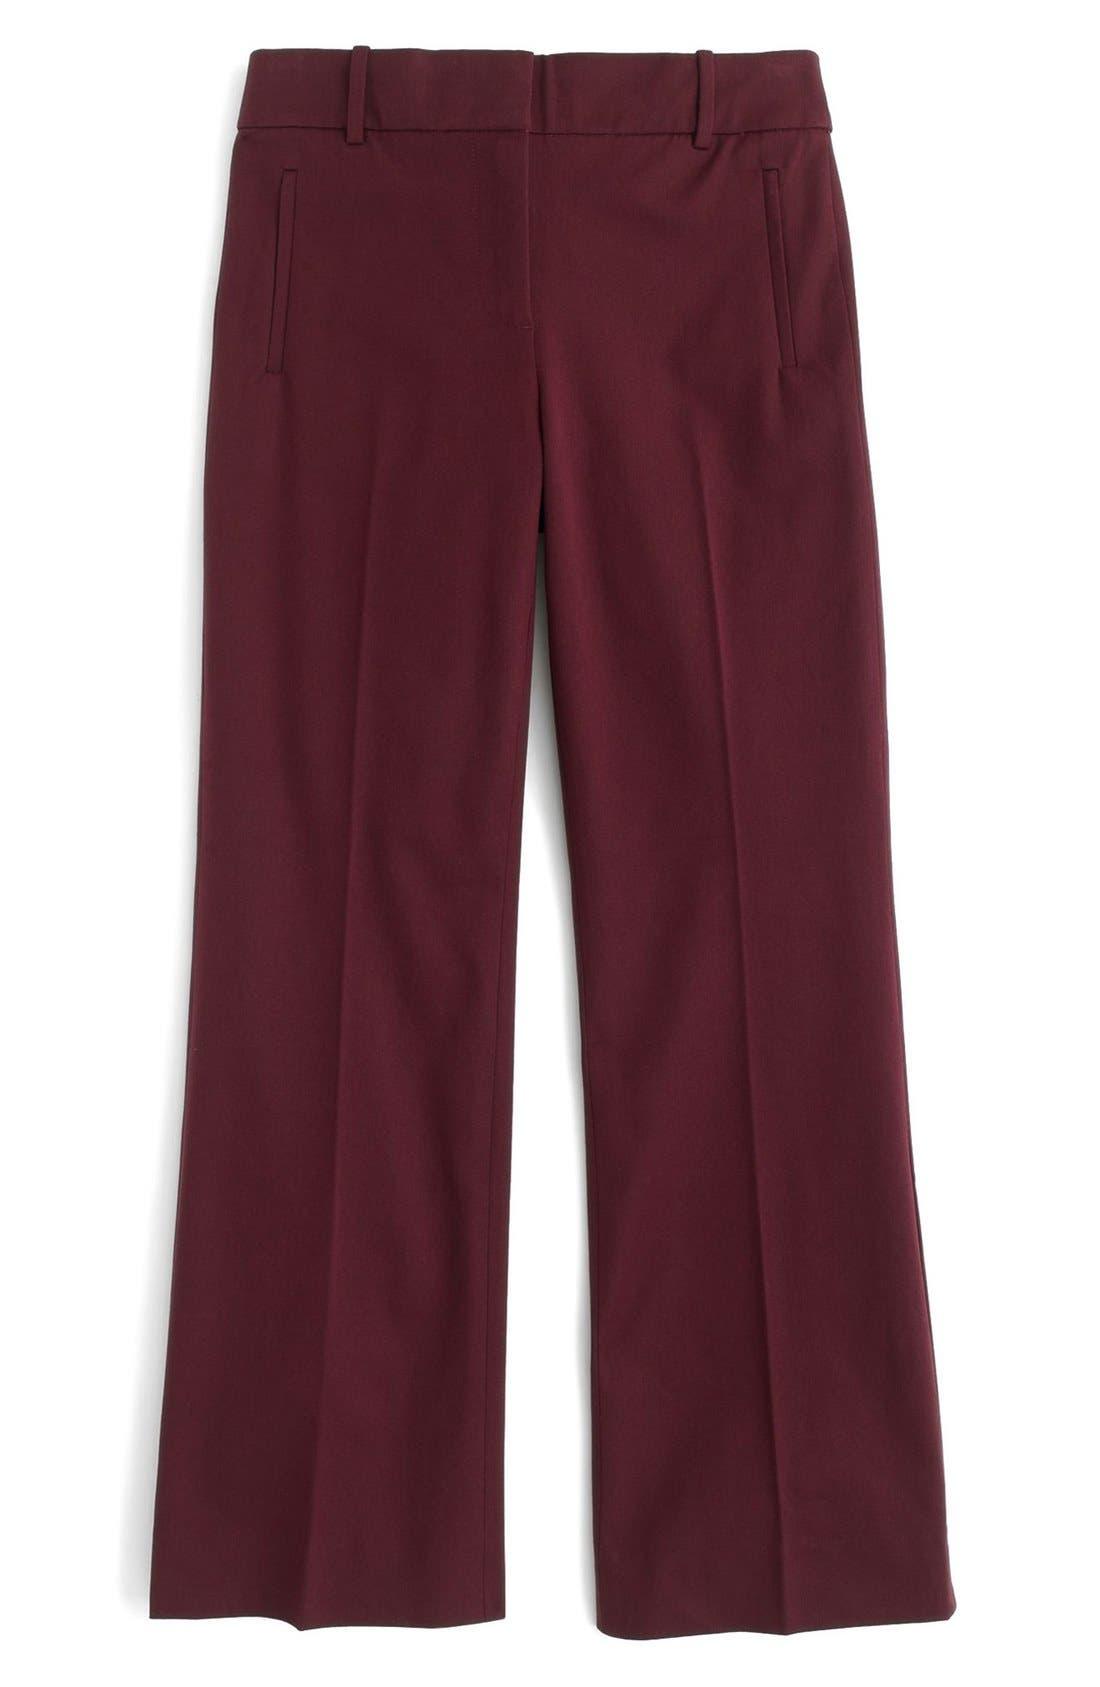 Alternate Image 3  - J.Crew 'Teddie' Bi-Stretch Cotton Blend Pants (Regular & Petite)